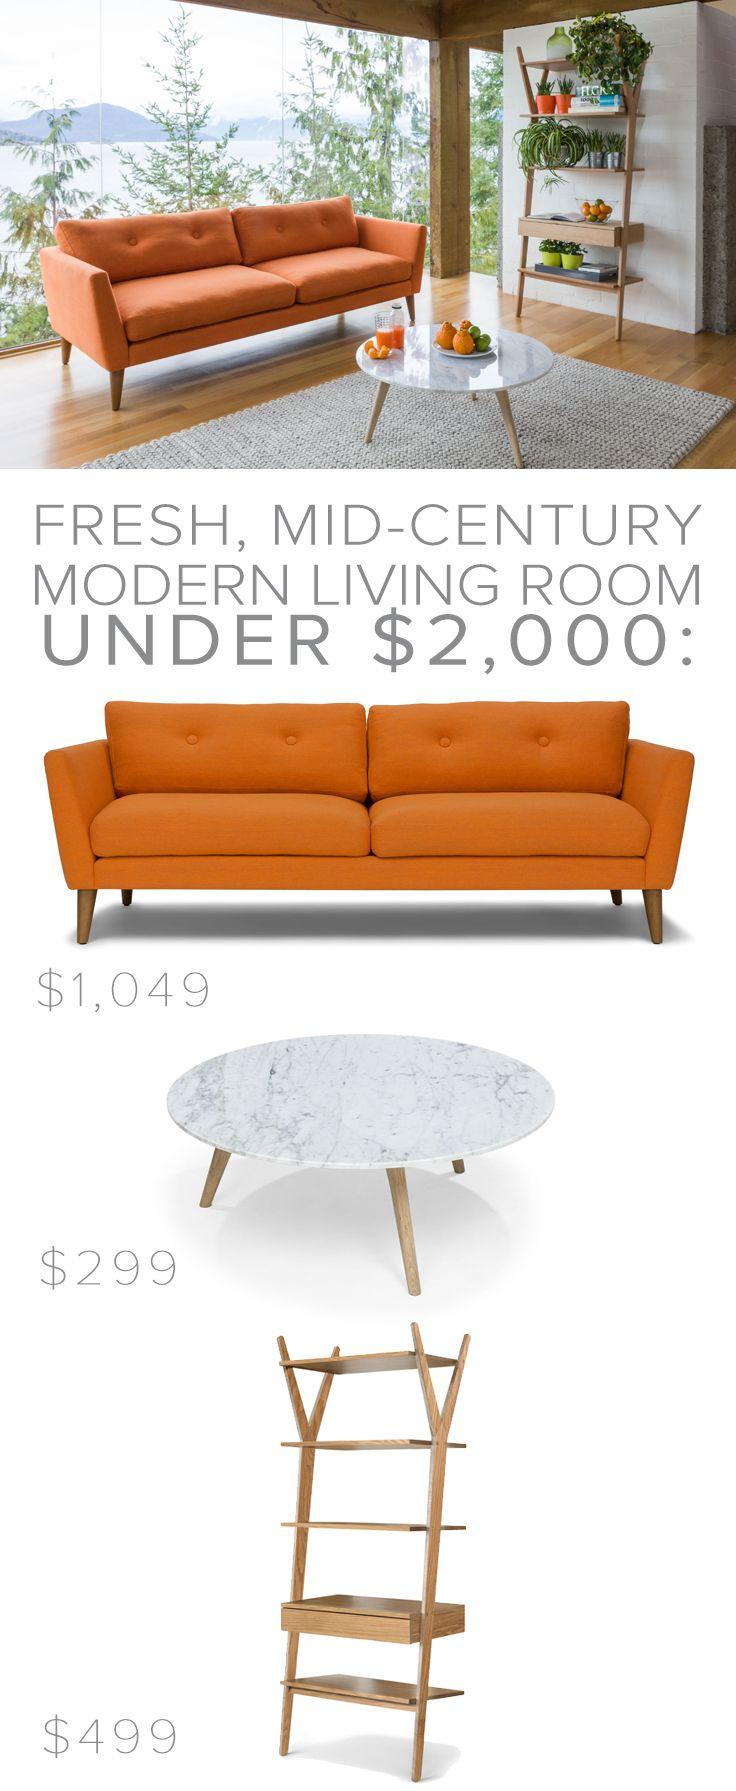 EMIL 'Papaya Orange' sofa // MARA 'Oak + Marble' coffee table // LIGNUM 'Solid Oak' shelving unit